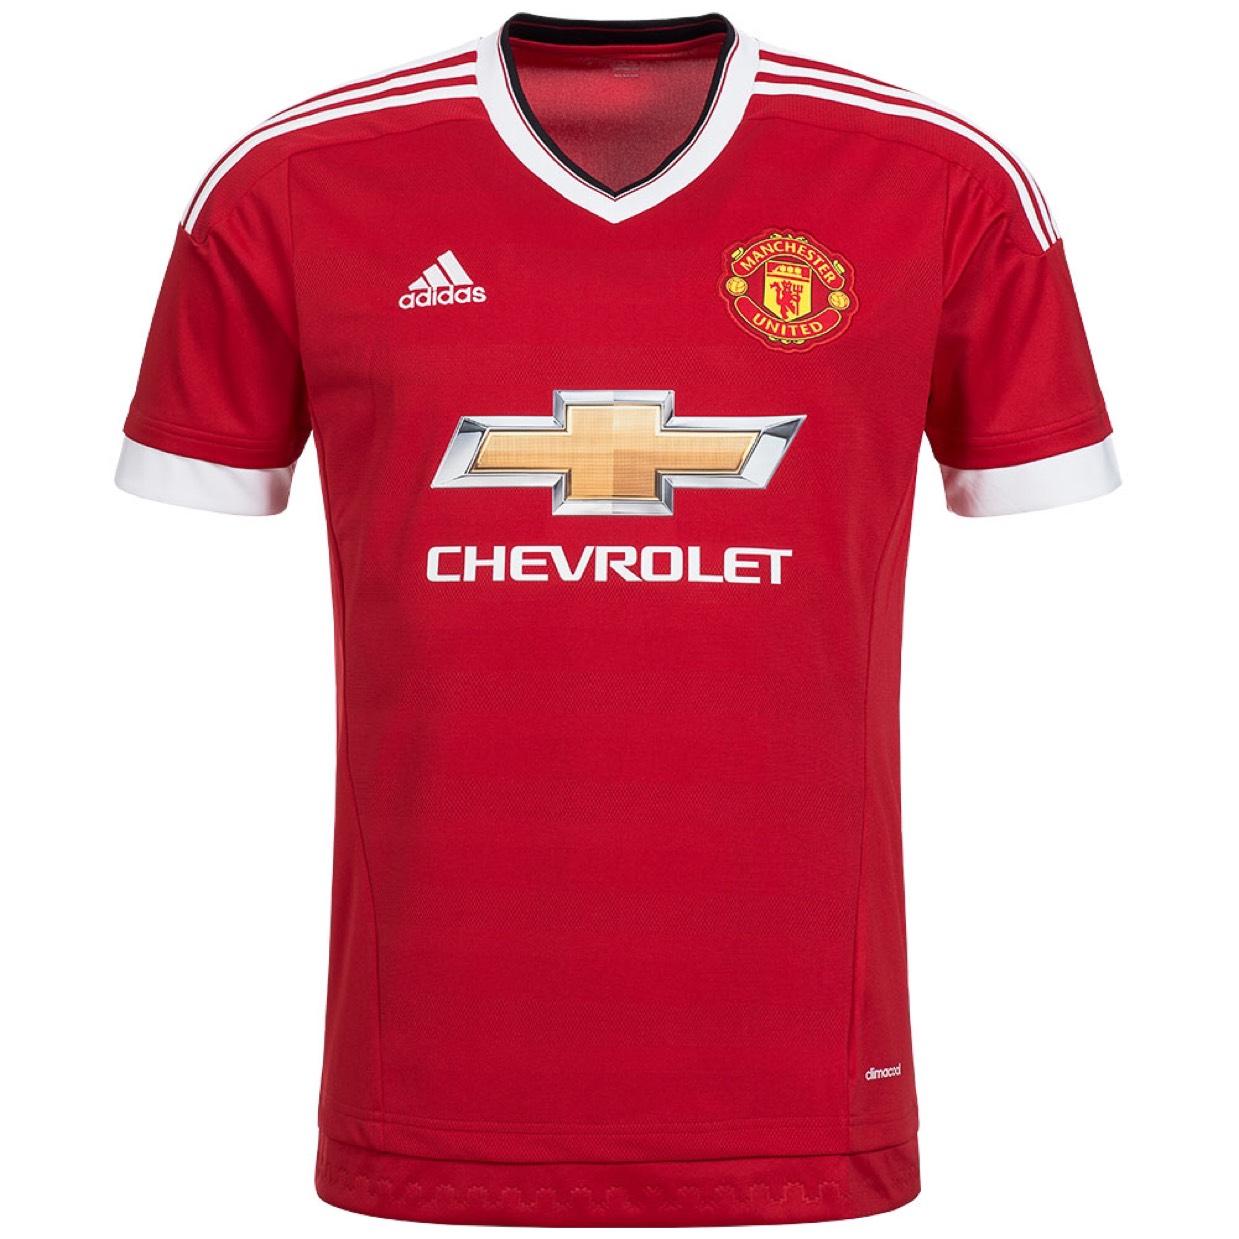 [Lokal Berlin Siemes Schuhcenter] Adidas Manchester United Trikot Home 2015/2016